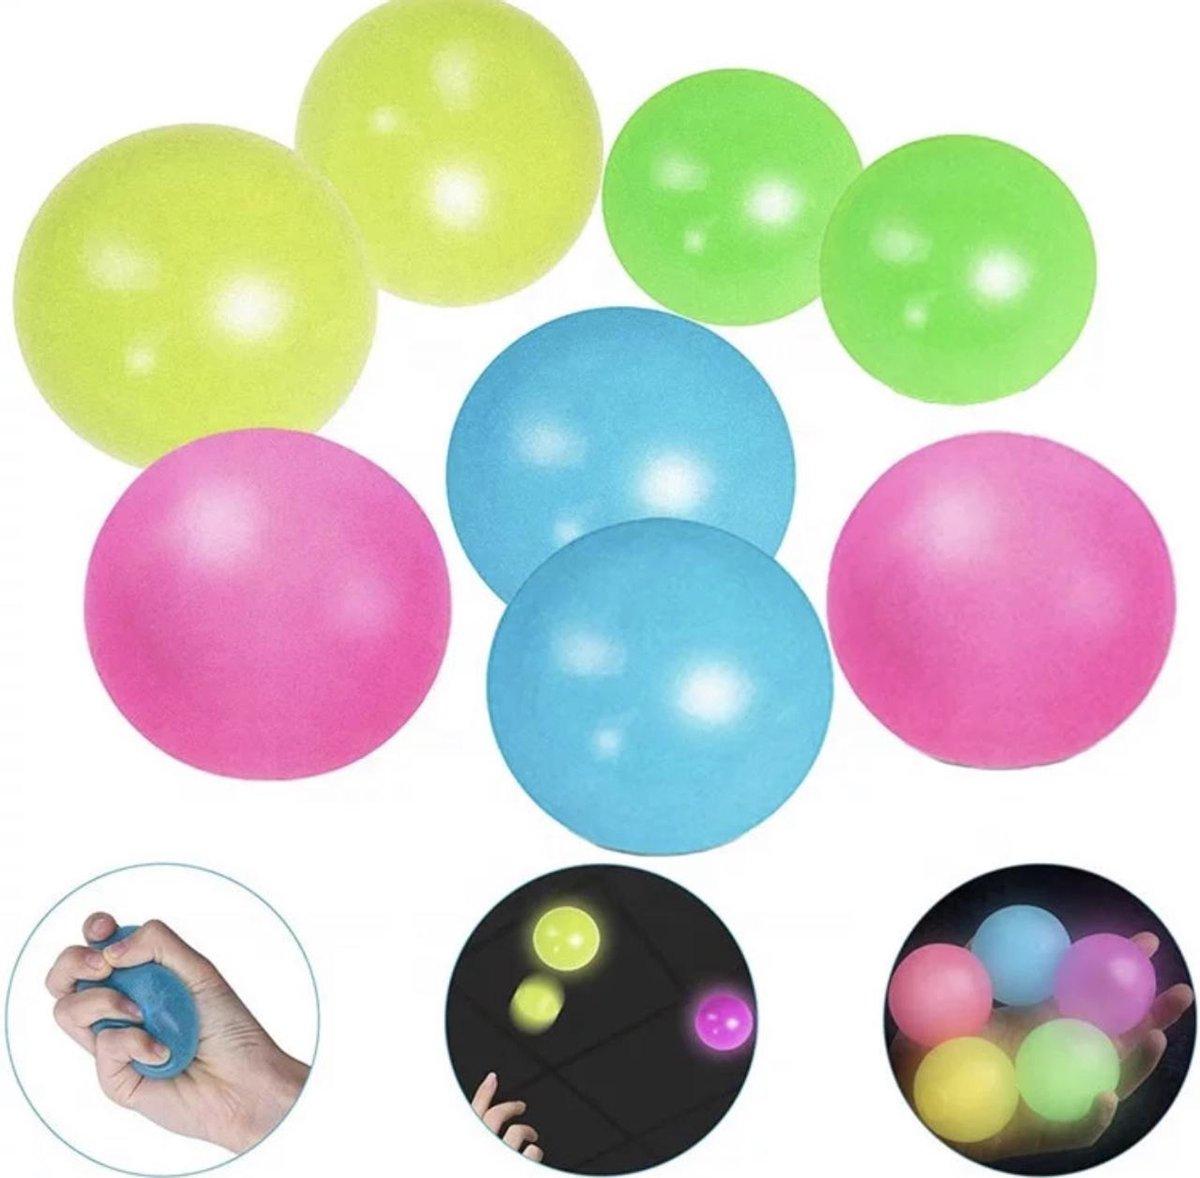 Without lemons   Fidget Sticky balls   globbles balls  TikTok Trend 2020-2021    Fidget toys pakket